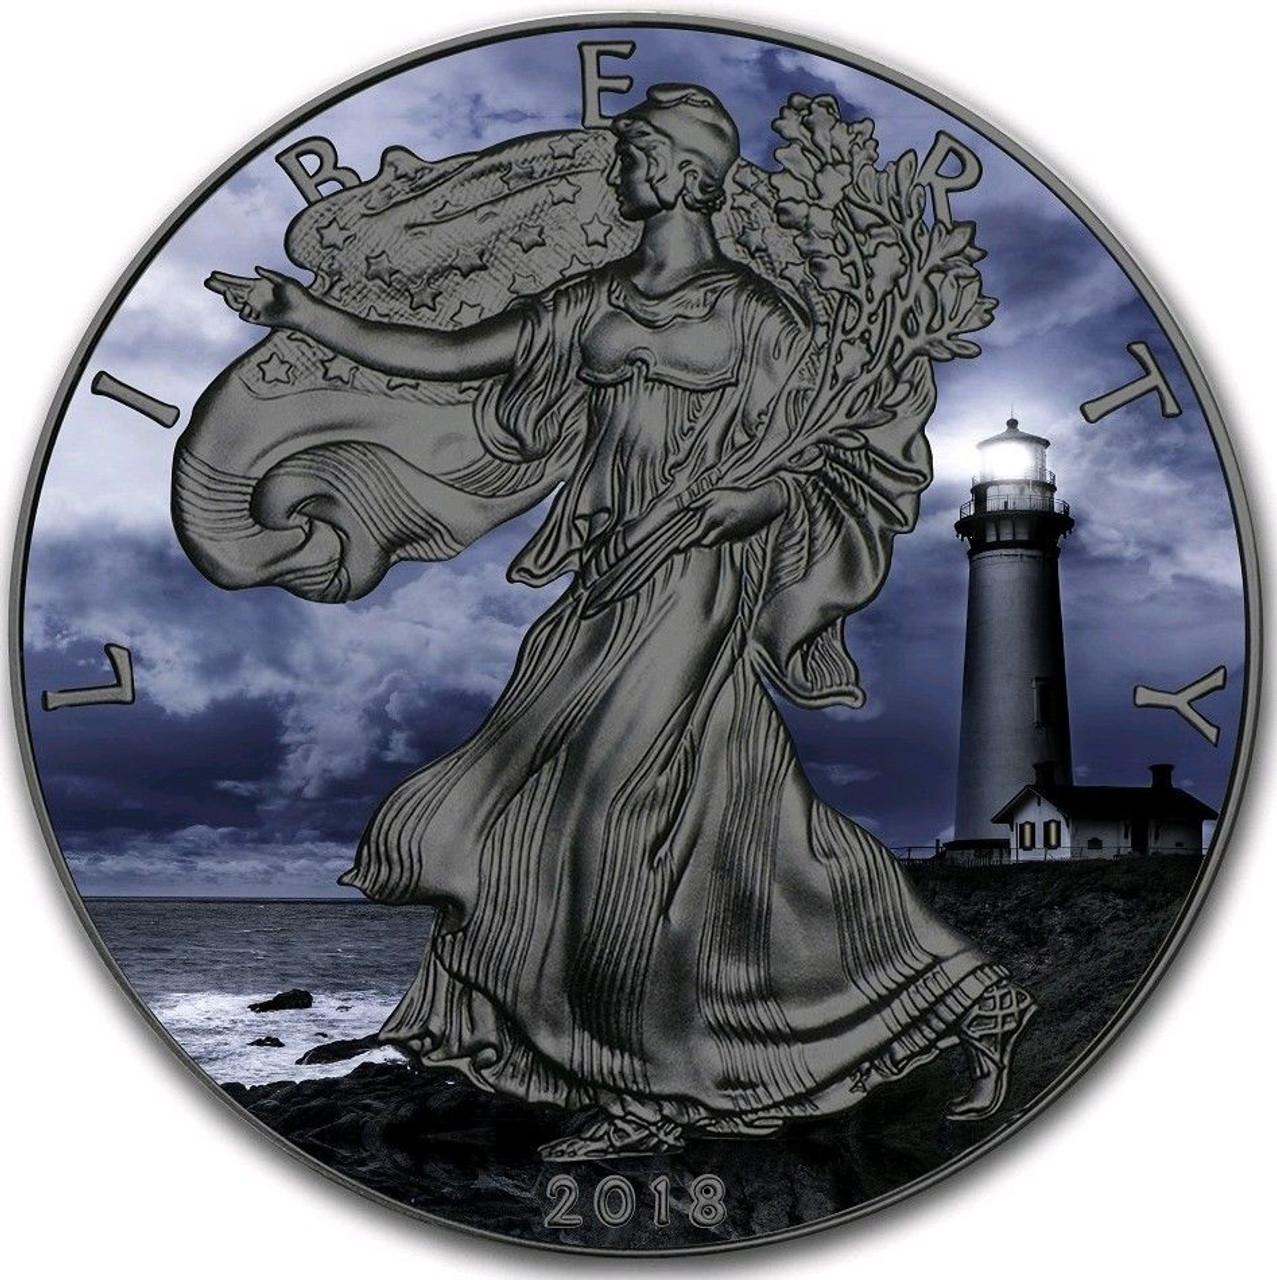 2018 1 Oz Silver  $1 NOTHERN LIGHT EAGLE Ruthenium Coin.